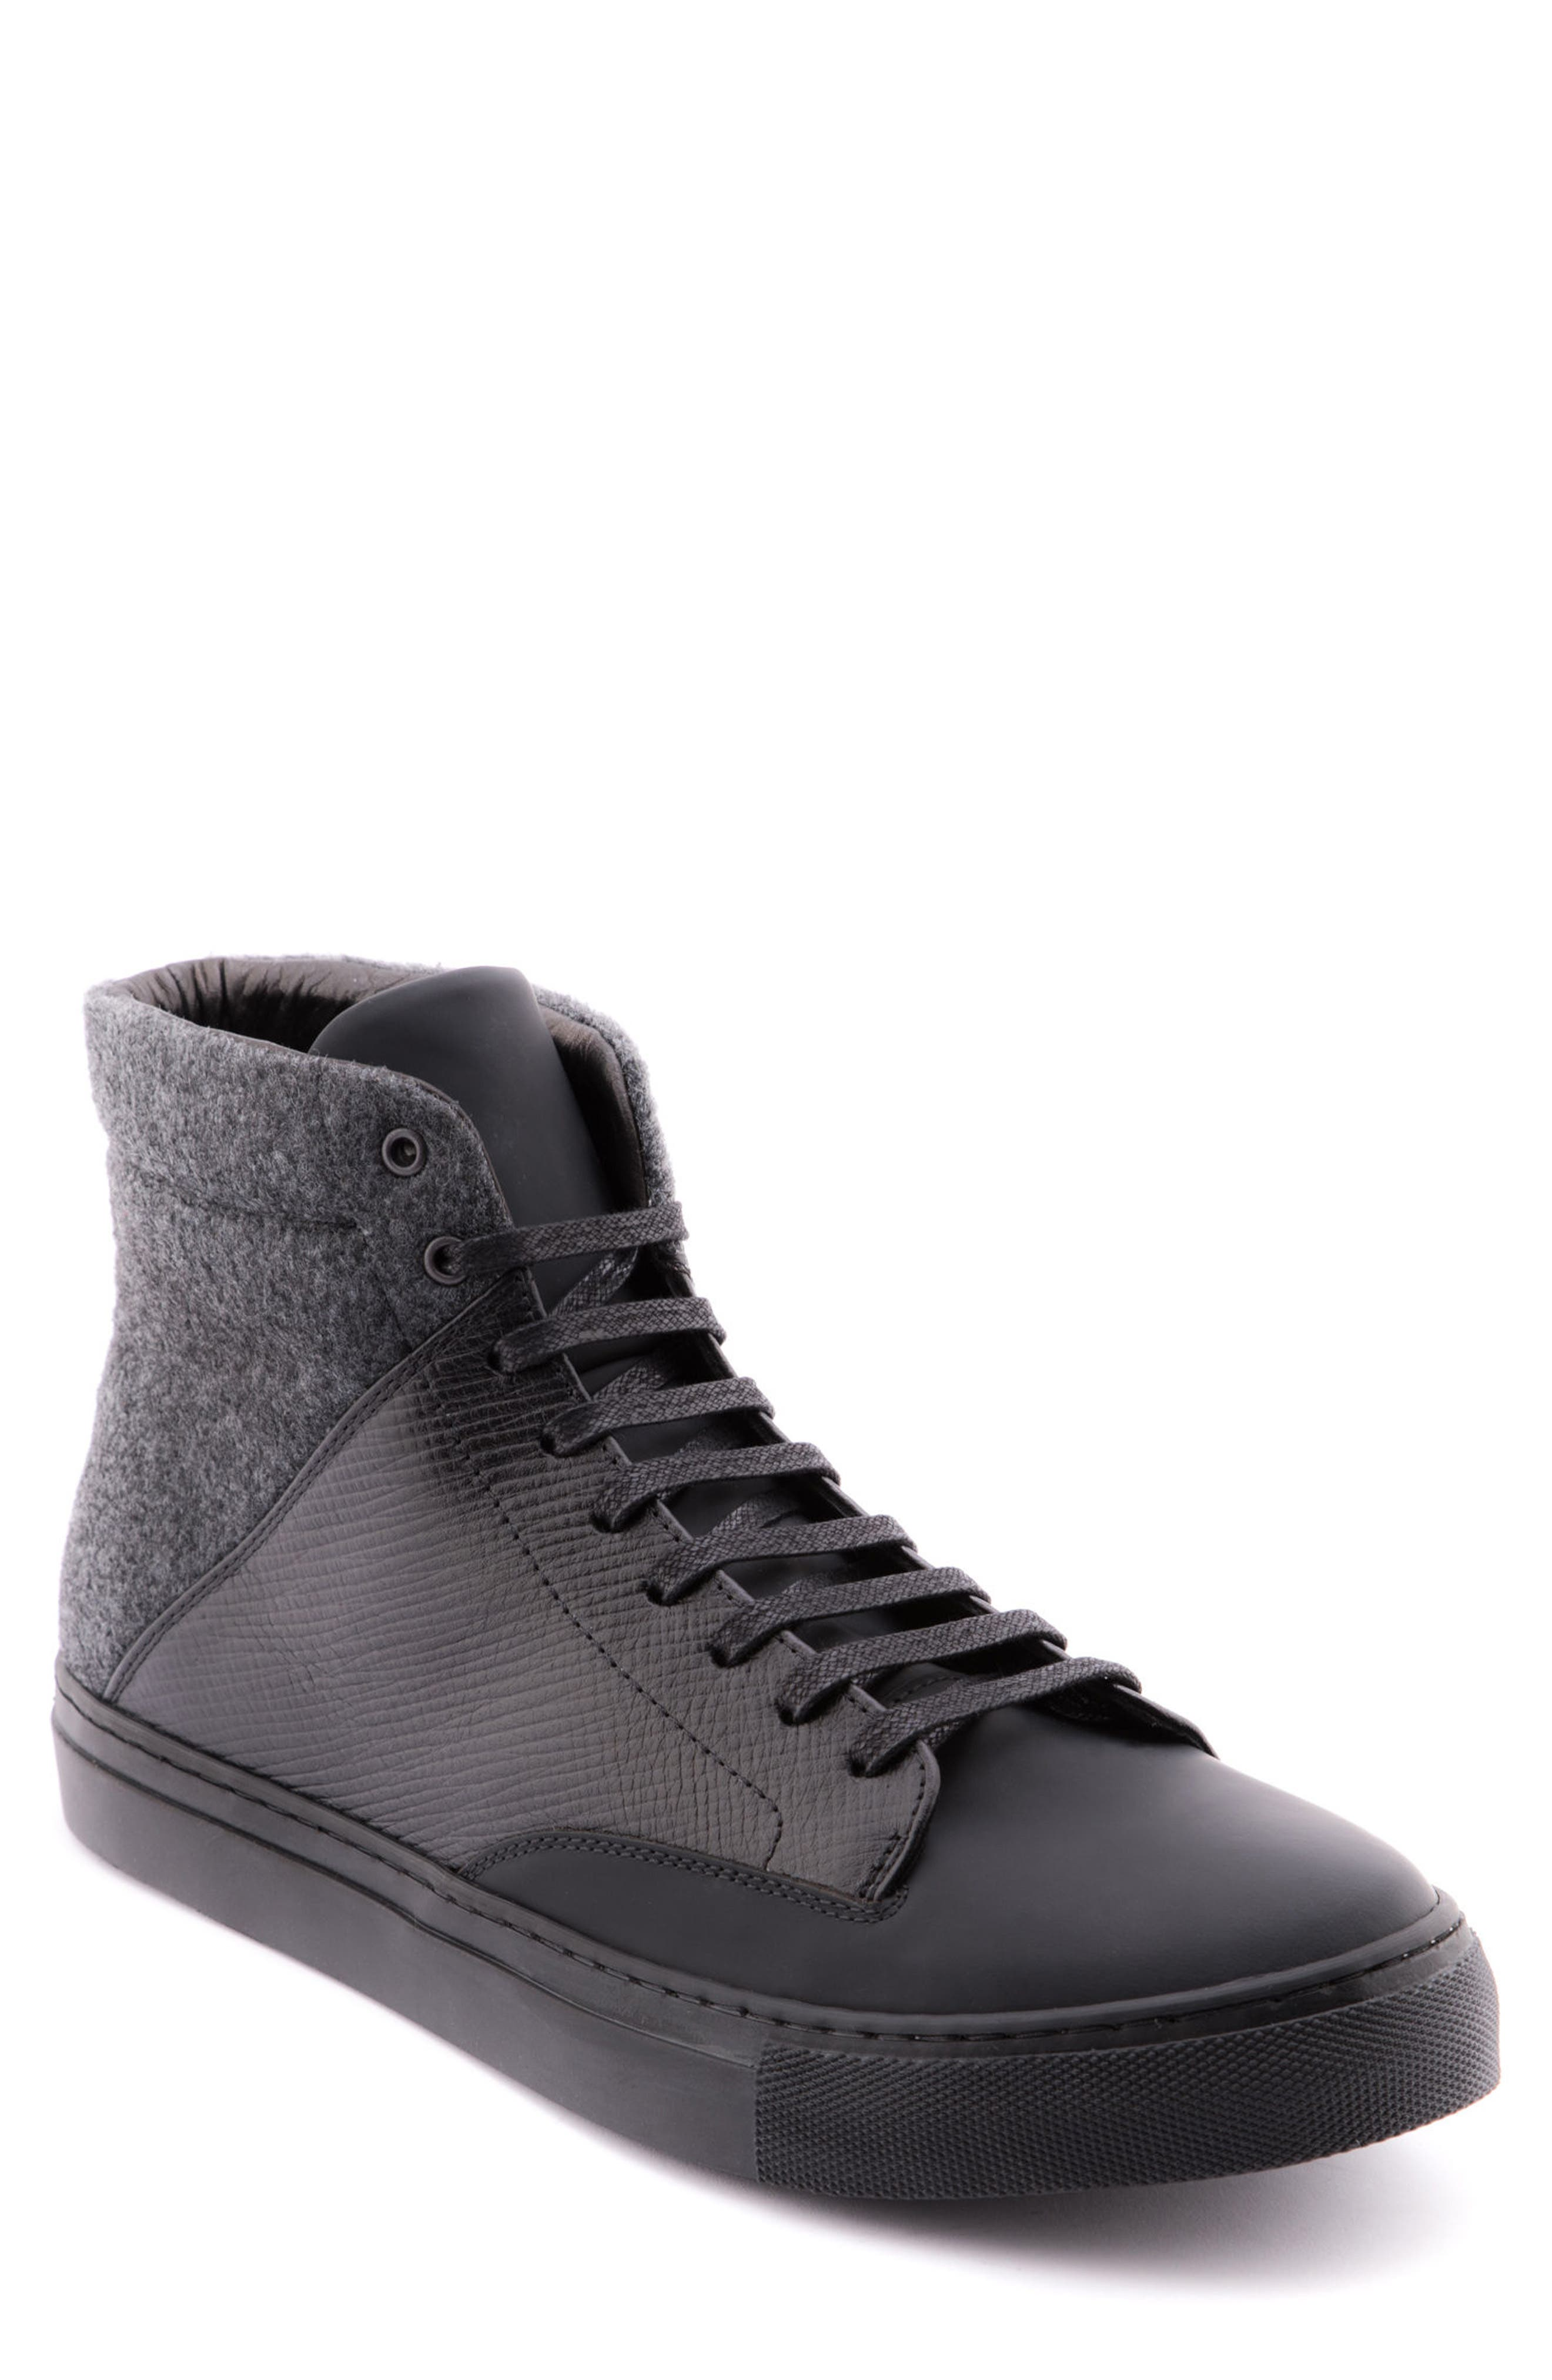 Alternate Image 1 Selected - Jared Lang Dylan Sneaker (Men)